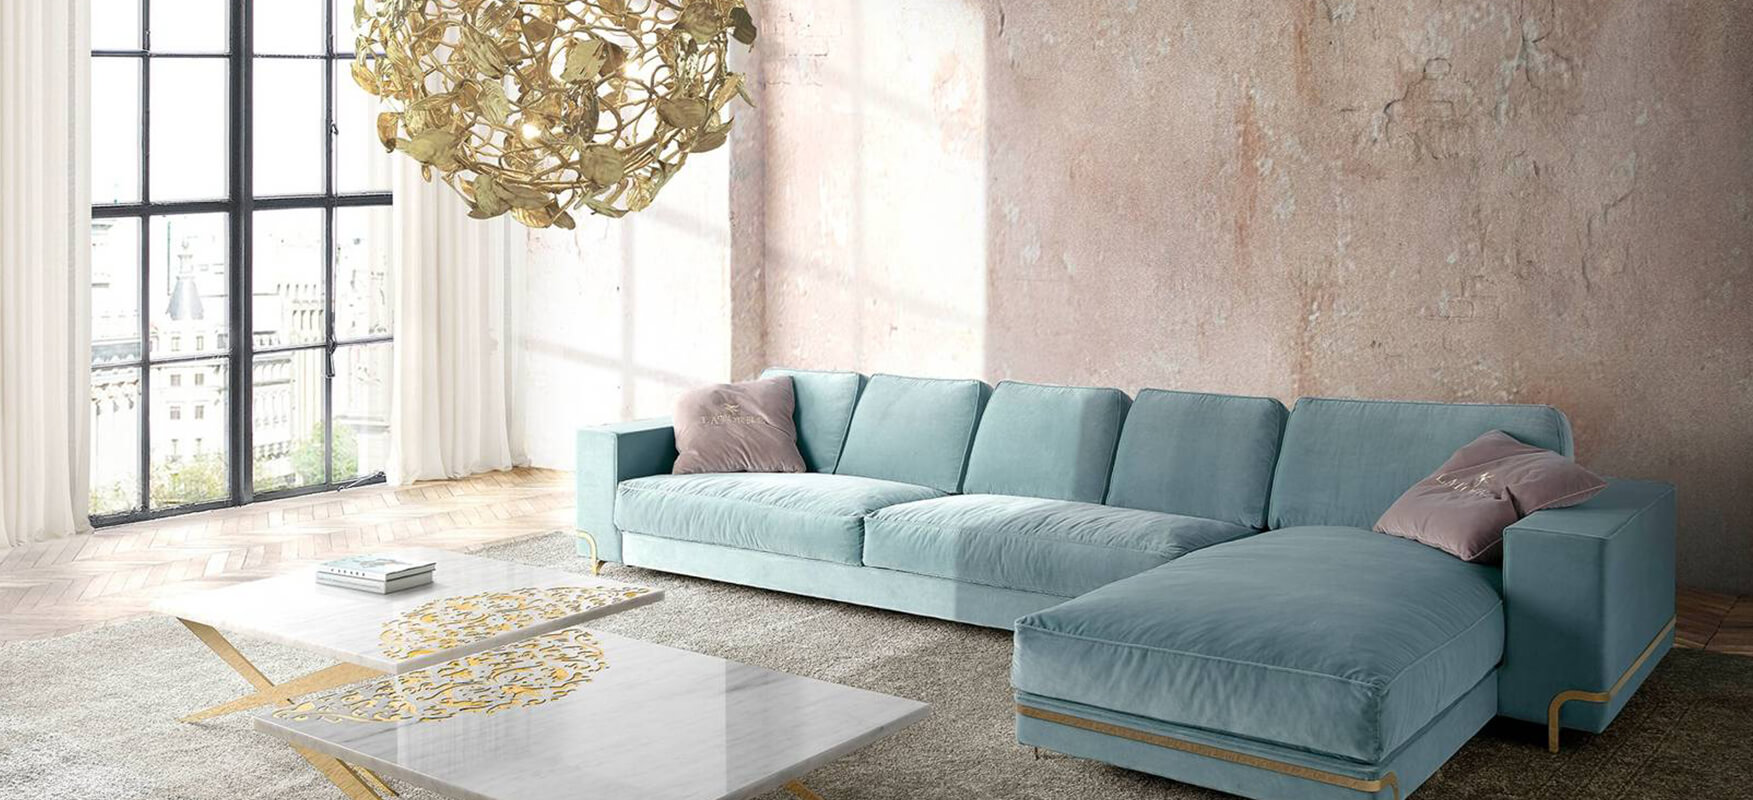 Chanecolor-Pinturas-decoracion-interiorismo-tapiceria